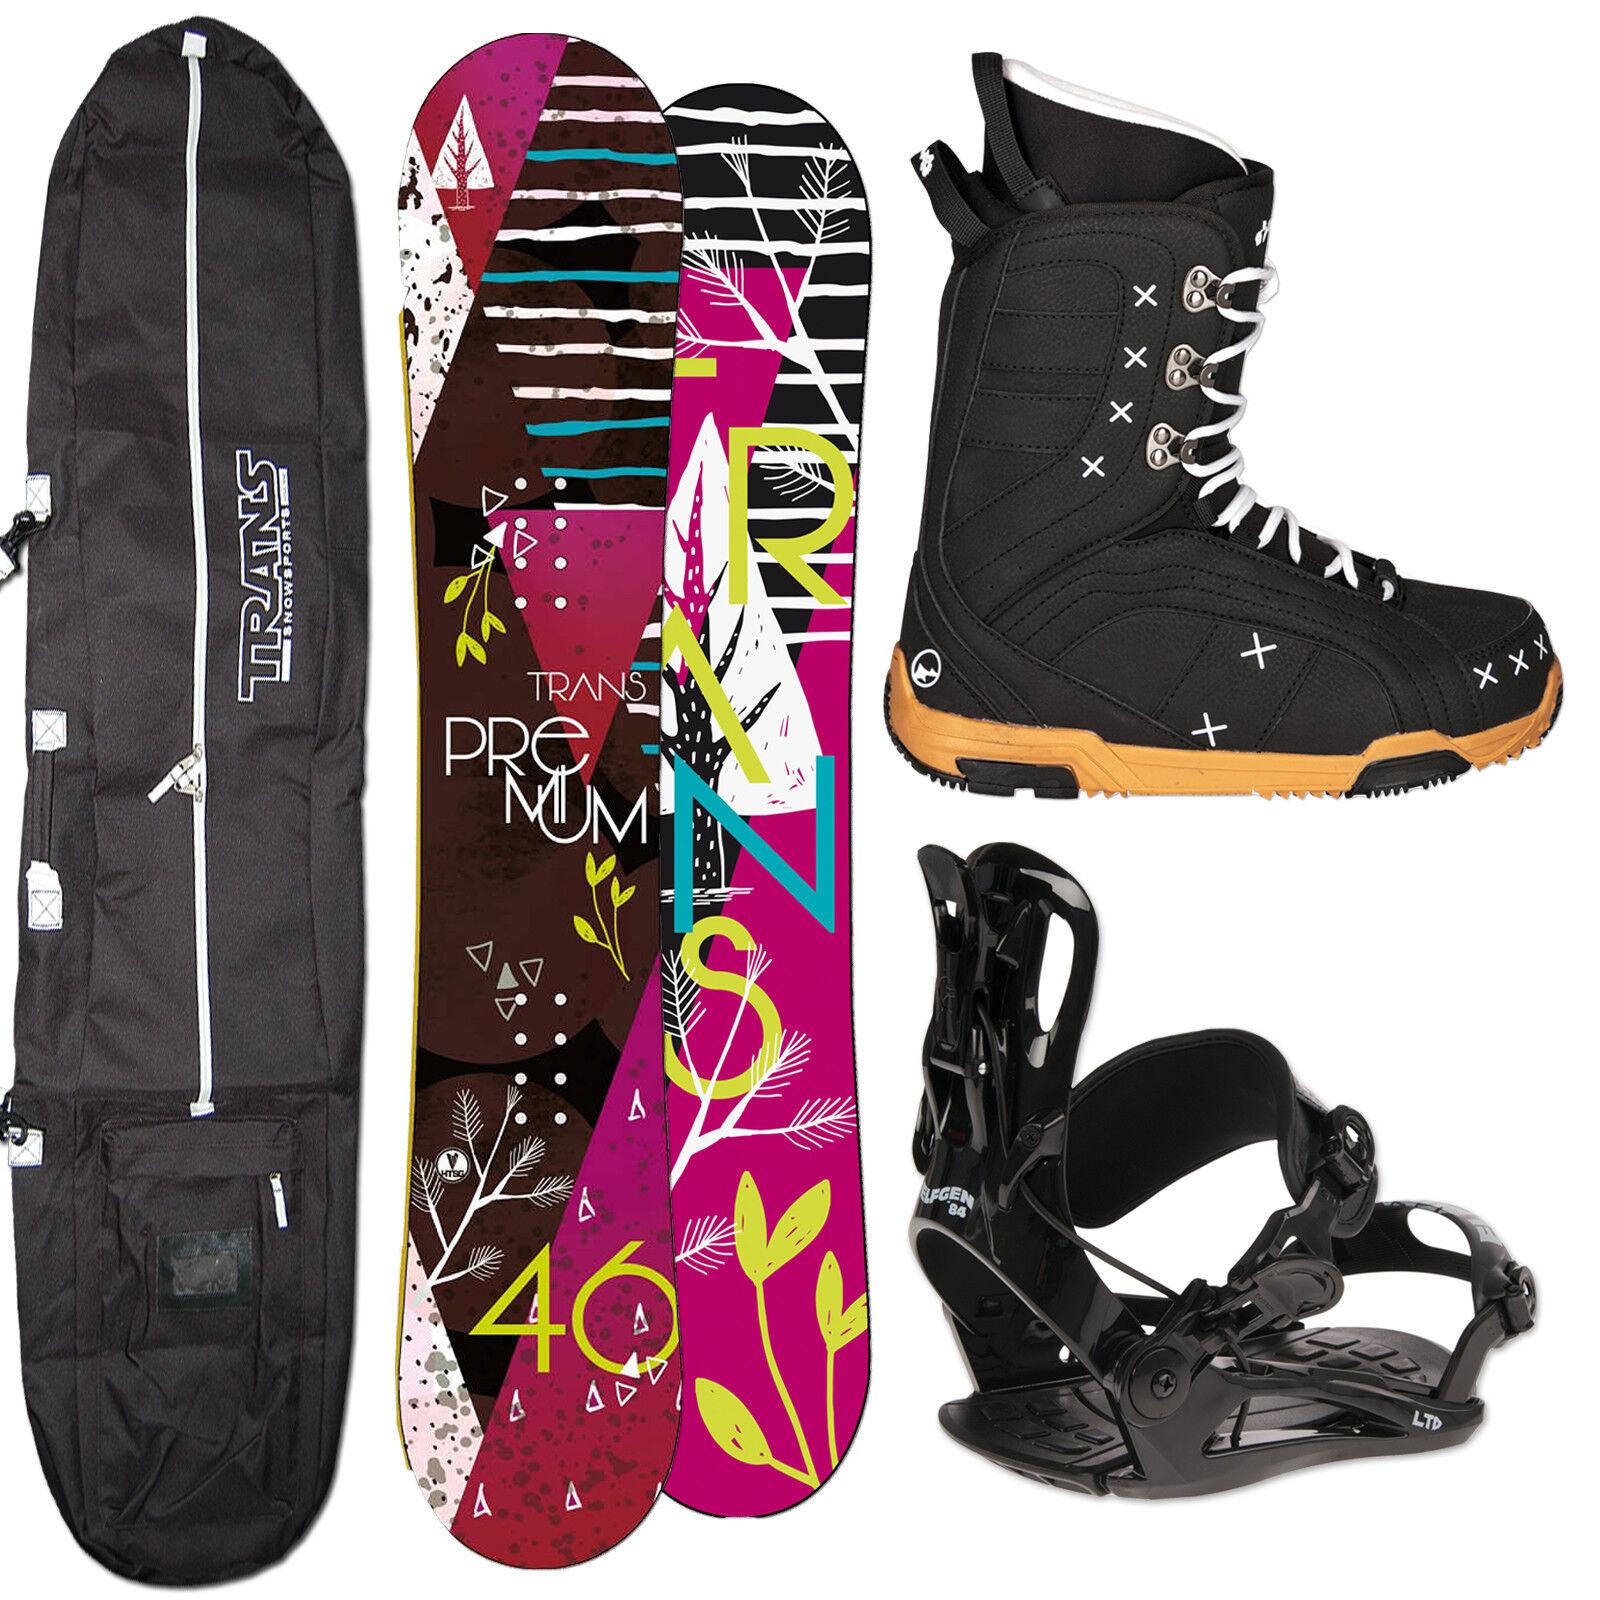 Snowboard Mujer Trans Premium 155cm + Fastec Fijación TALLA M + botas + Bolsa